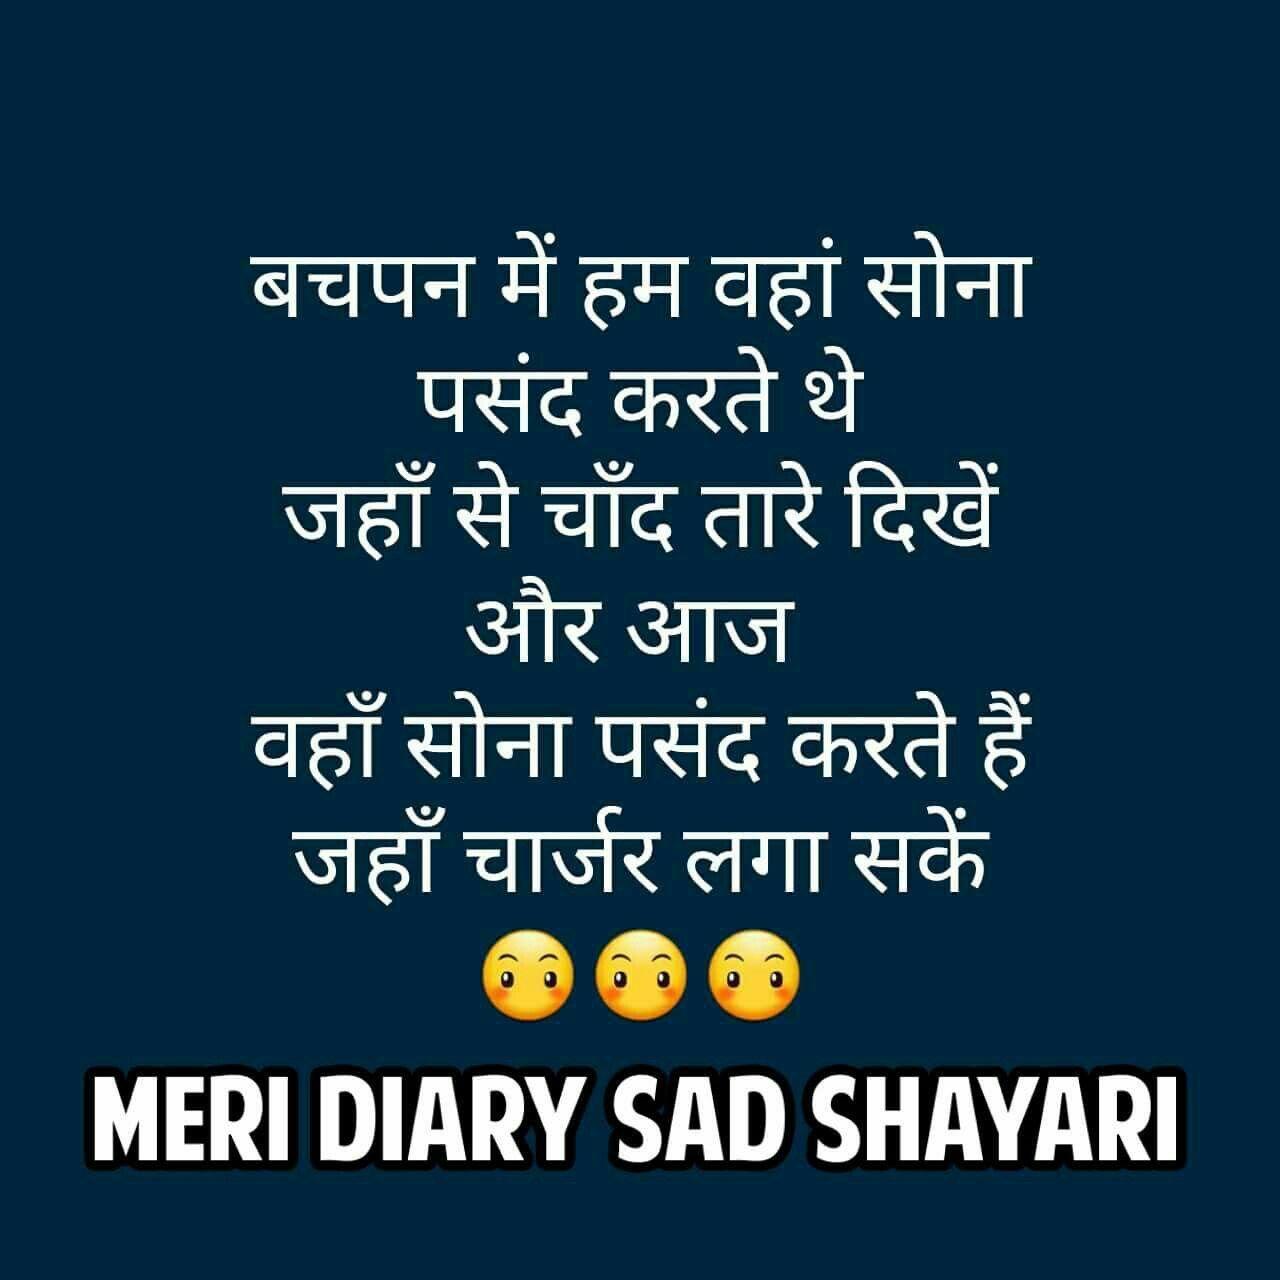 Meri Dairy Se Sad: Pin By Akash Rathor On Meri Diary/Sad Shayari